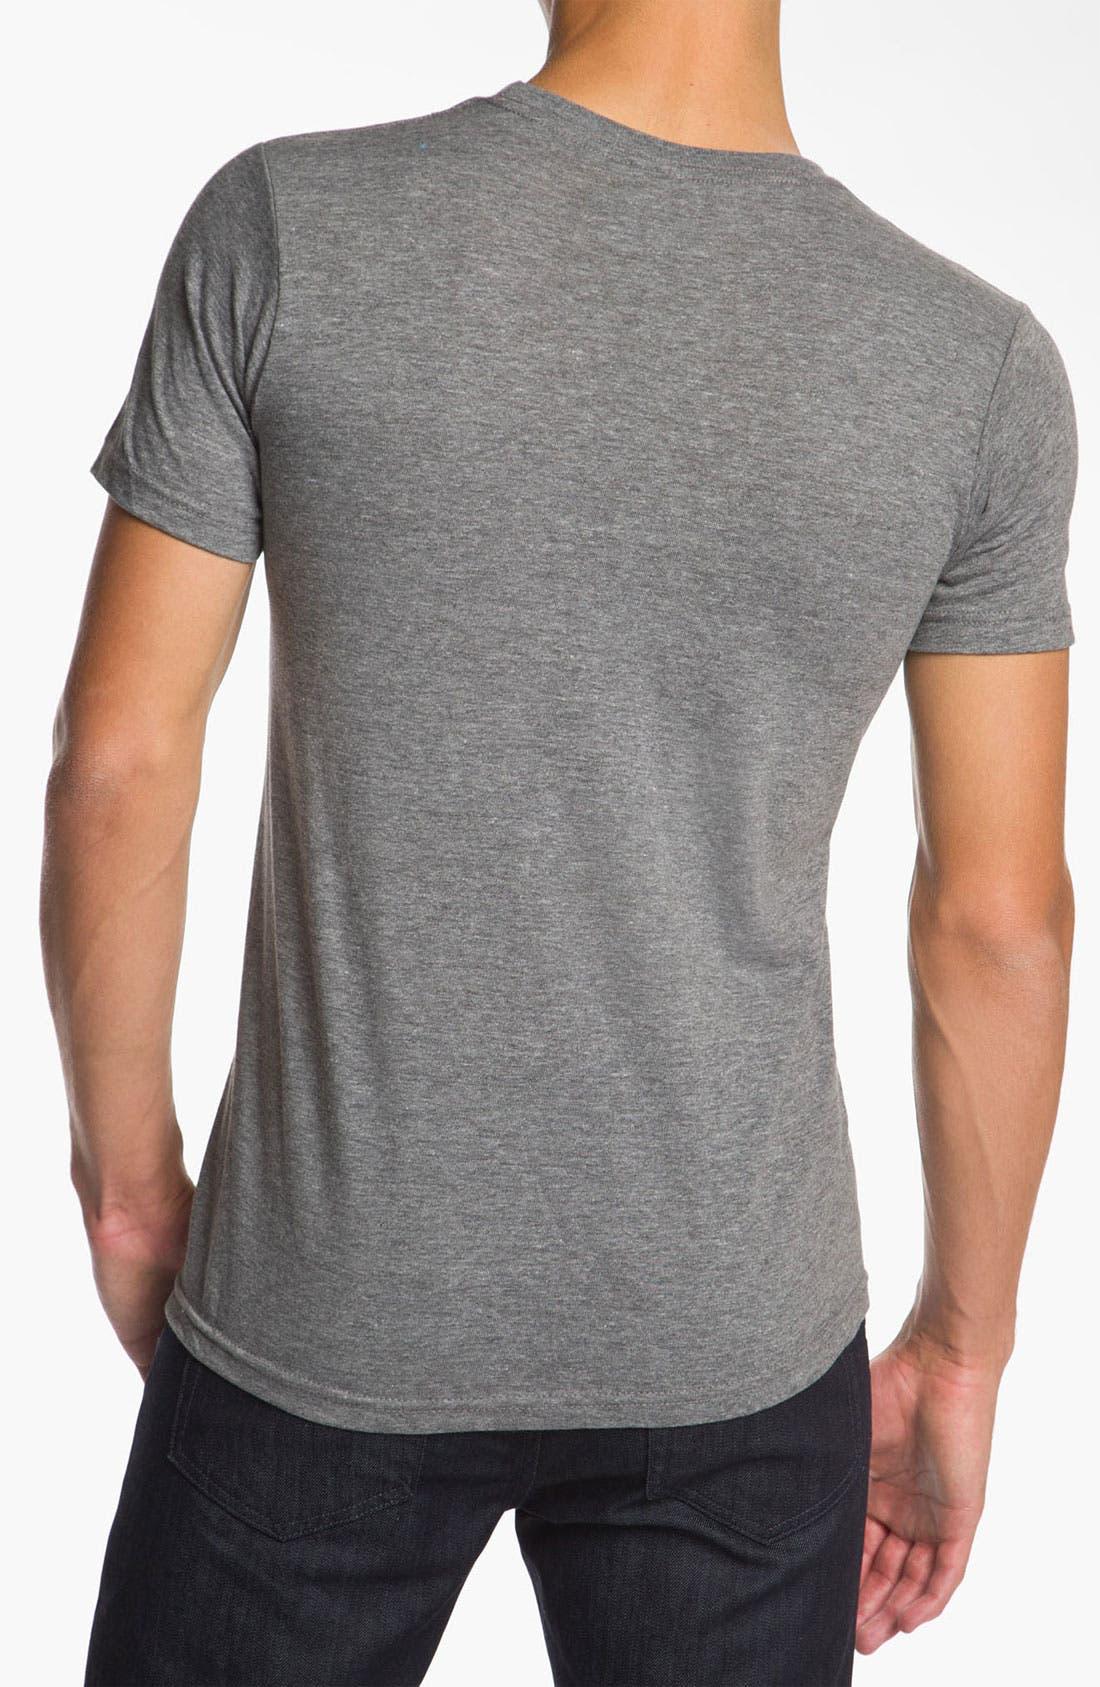 Alternate Image 2  - Ames Bros 'Bjorn to Skate' Trim Fit Crewneck T-Shirt (Men)